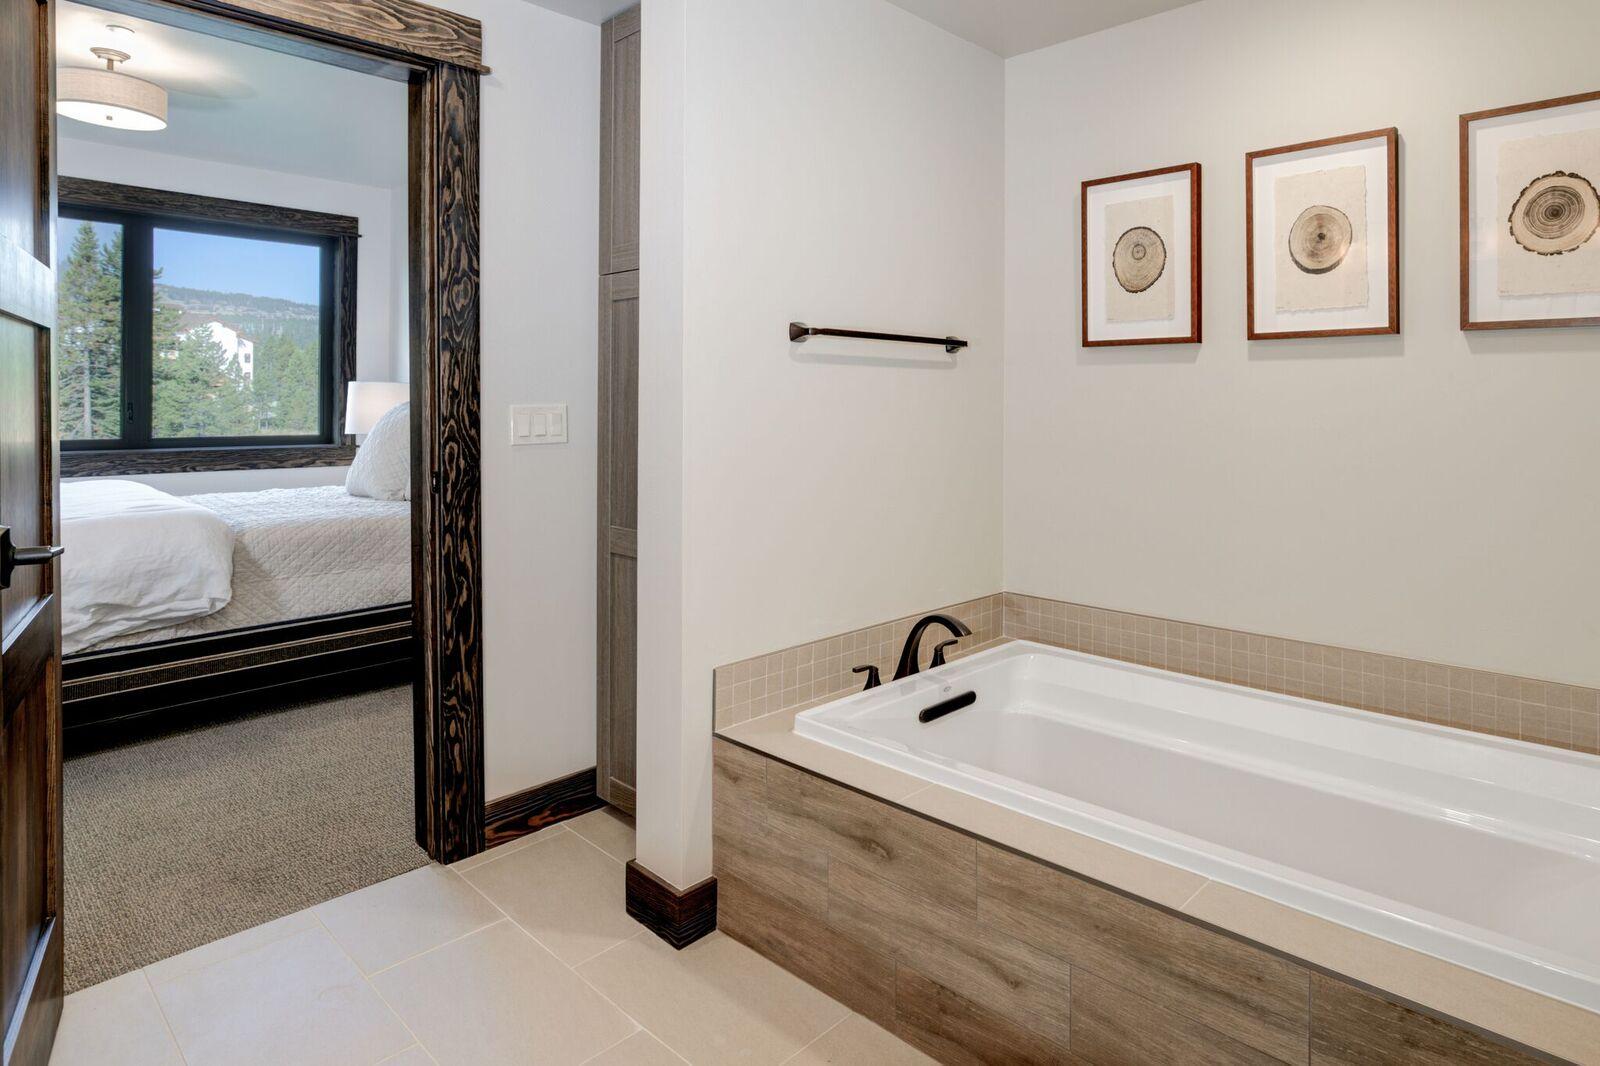 102 Master Bath 1.jpeg